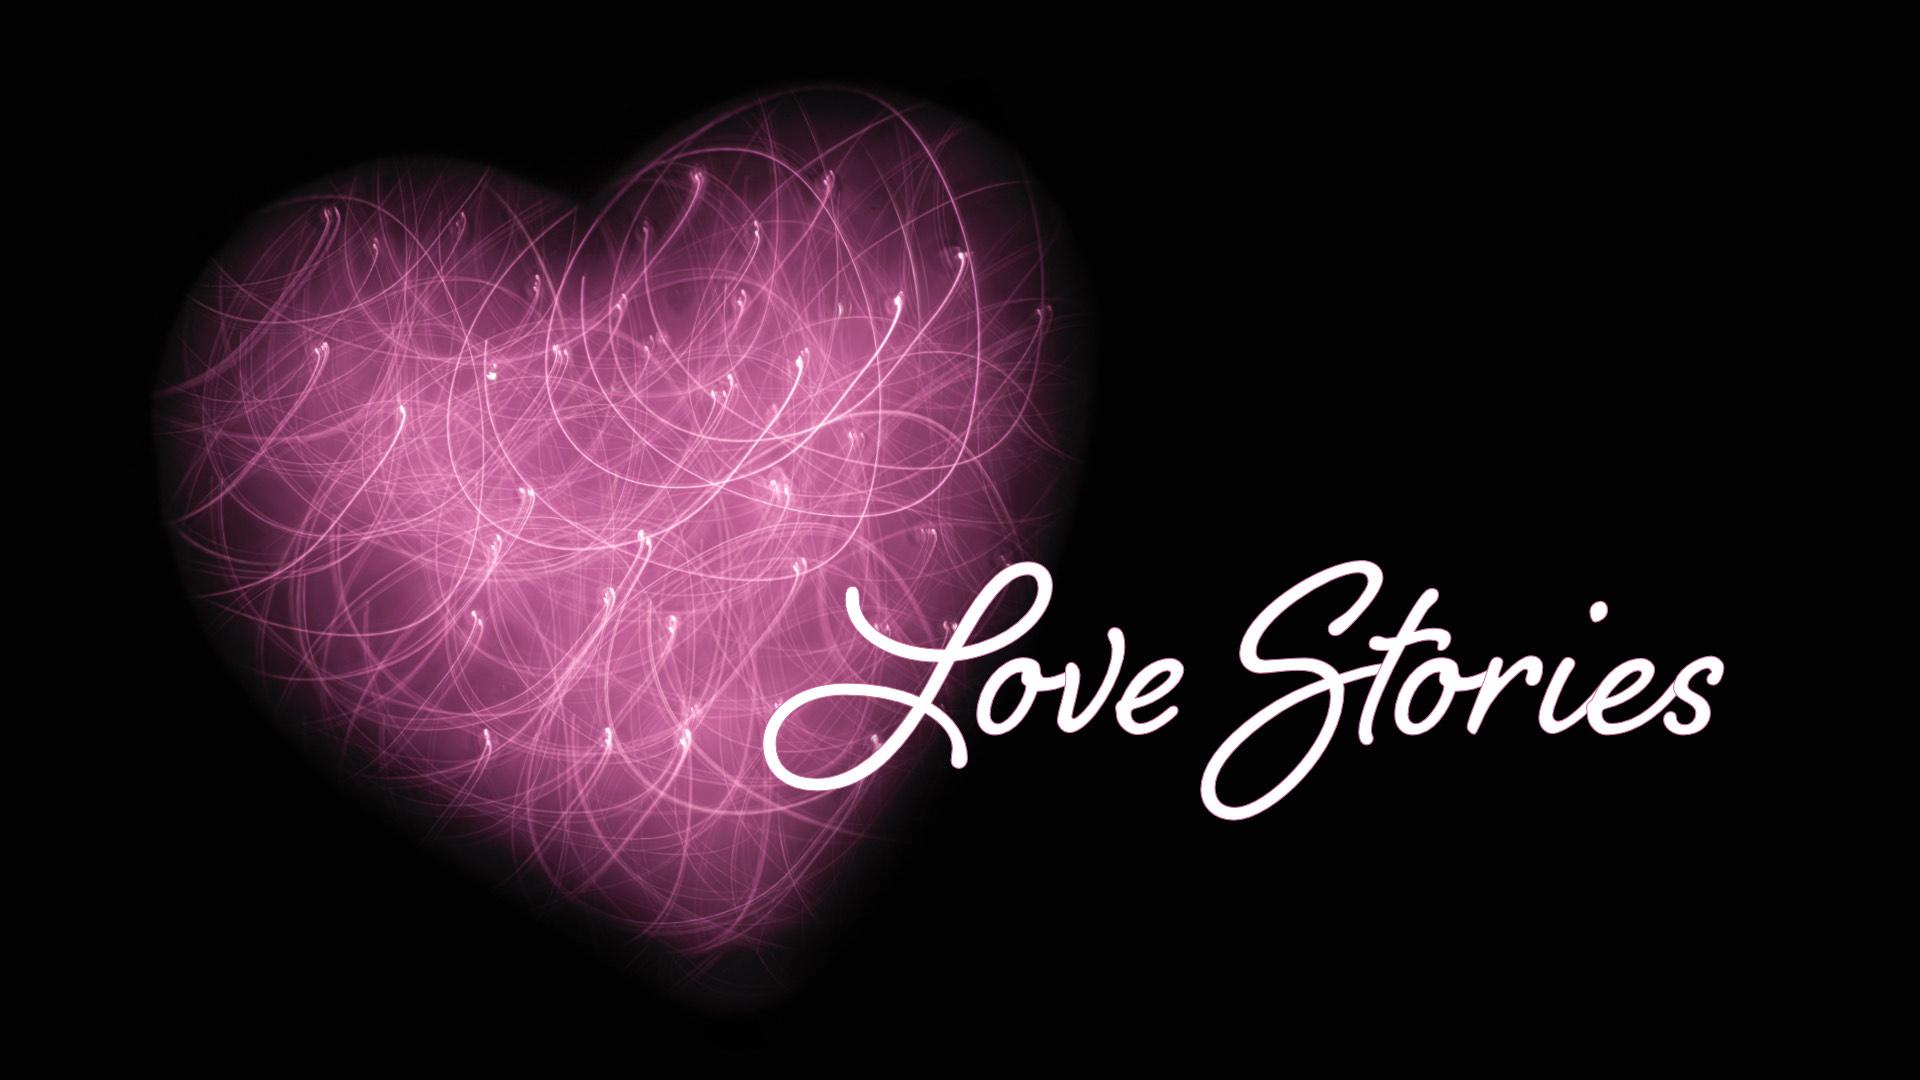 Love Stories Image